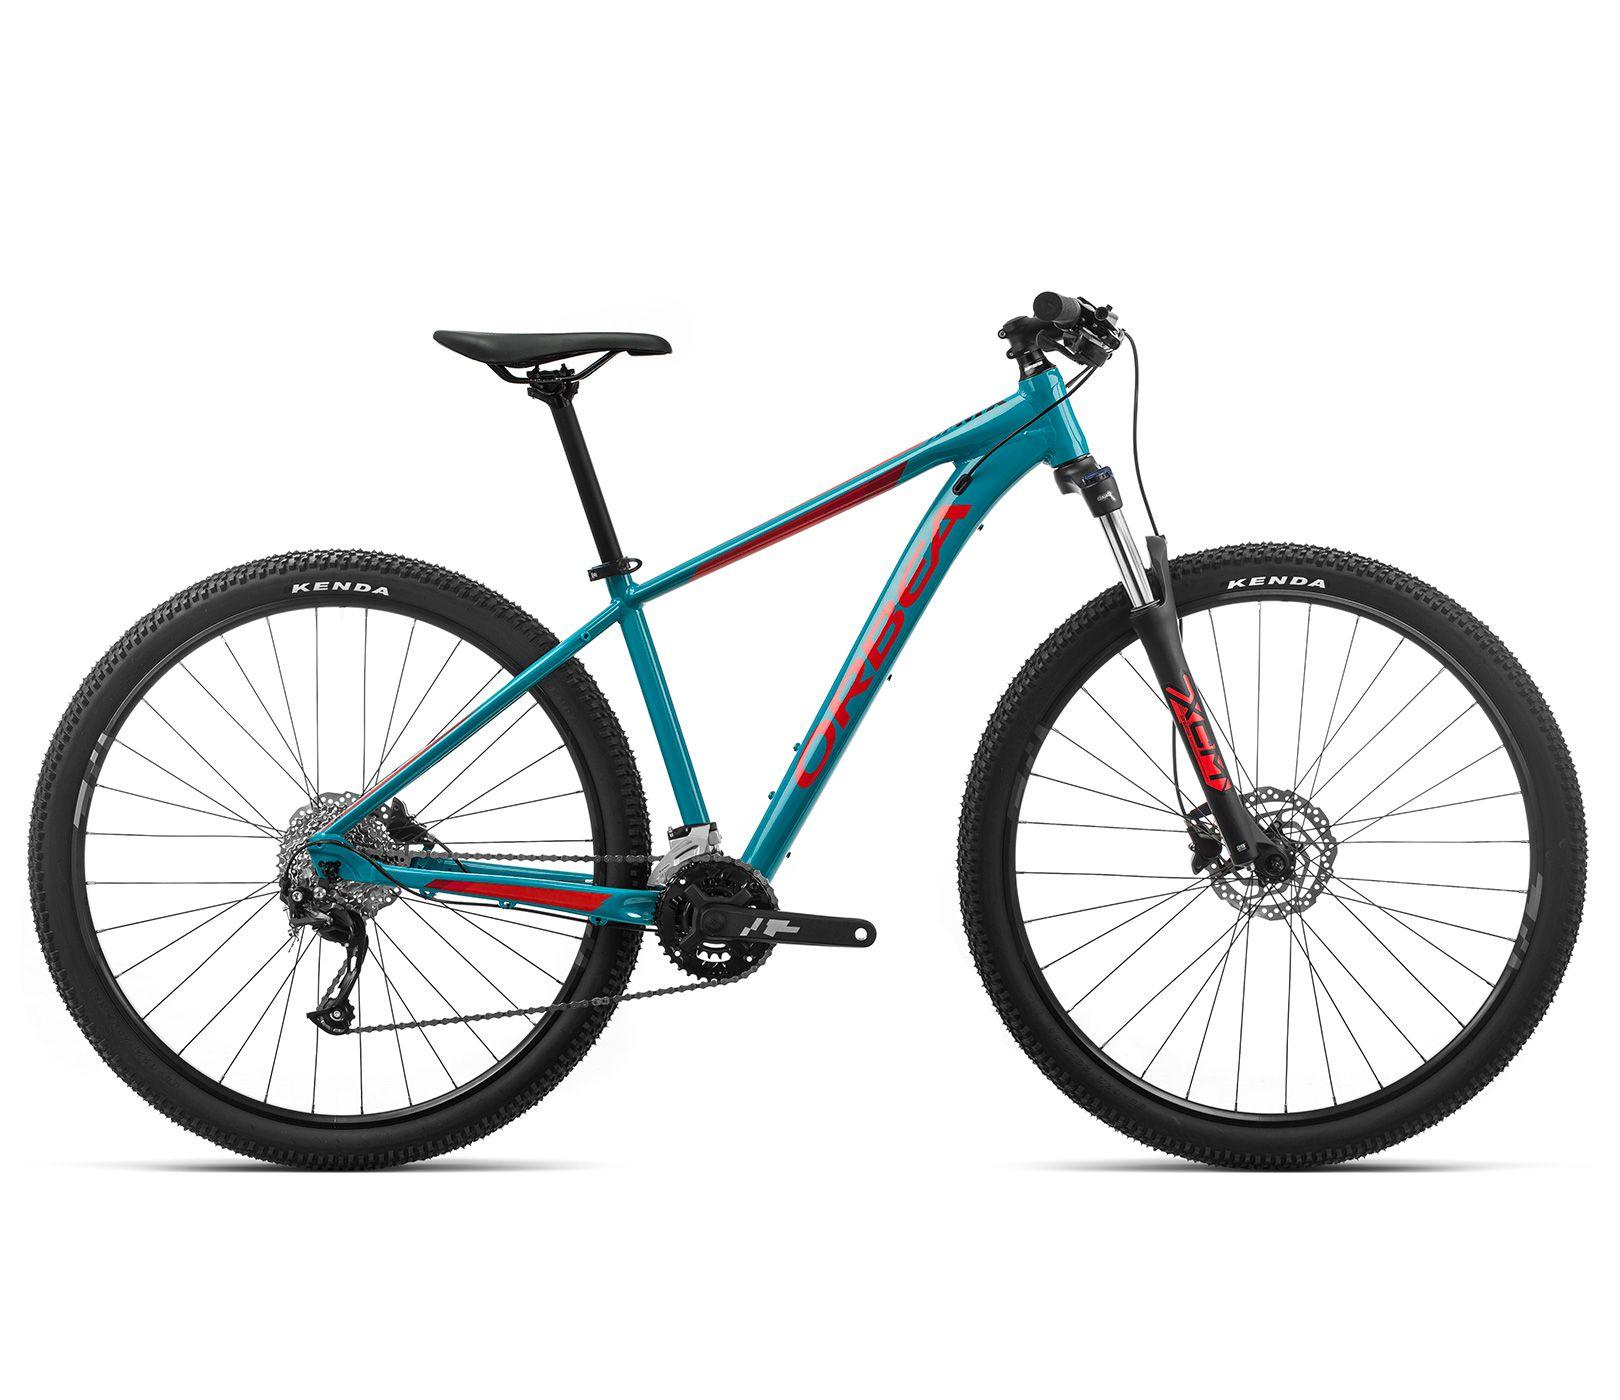 Bicicleta MTB Orbea MX 29 40 - Tam L - Azul/Vermelha 2020